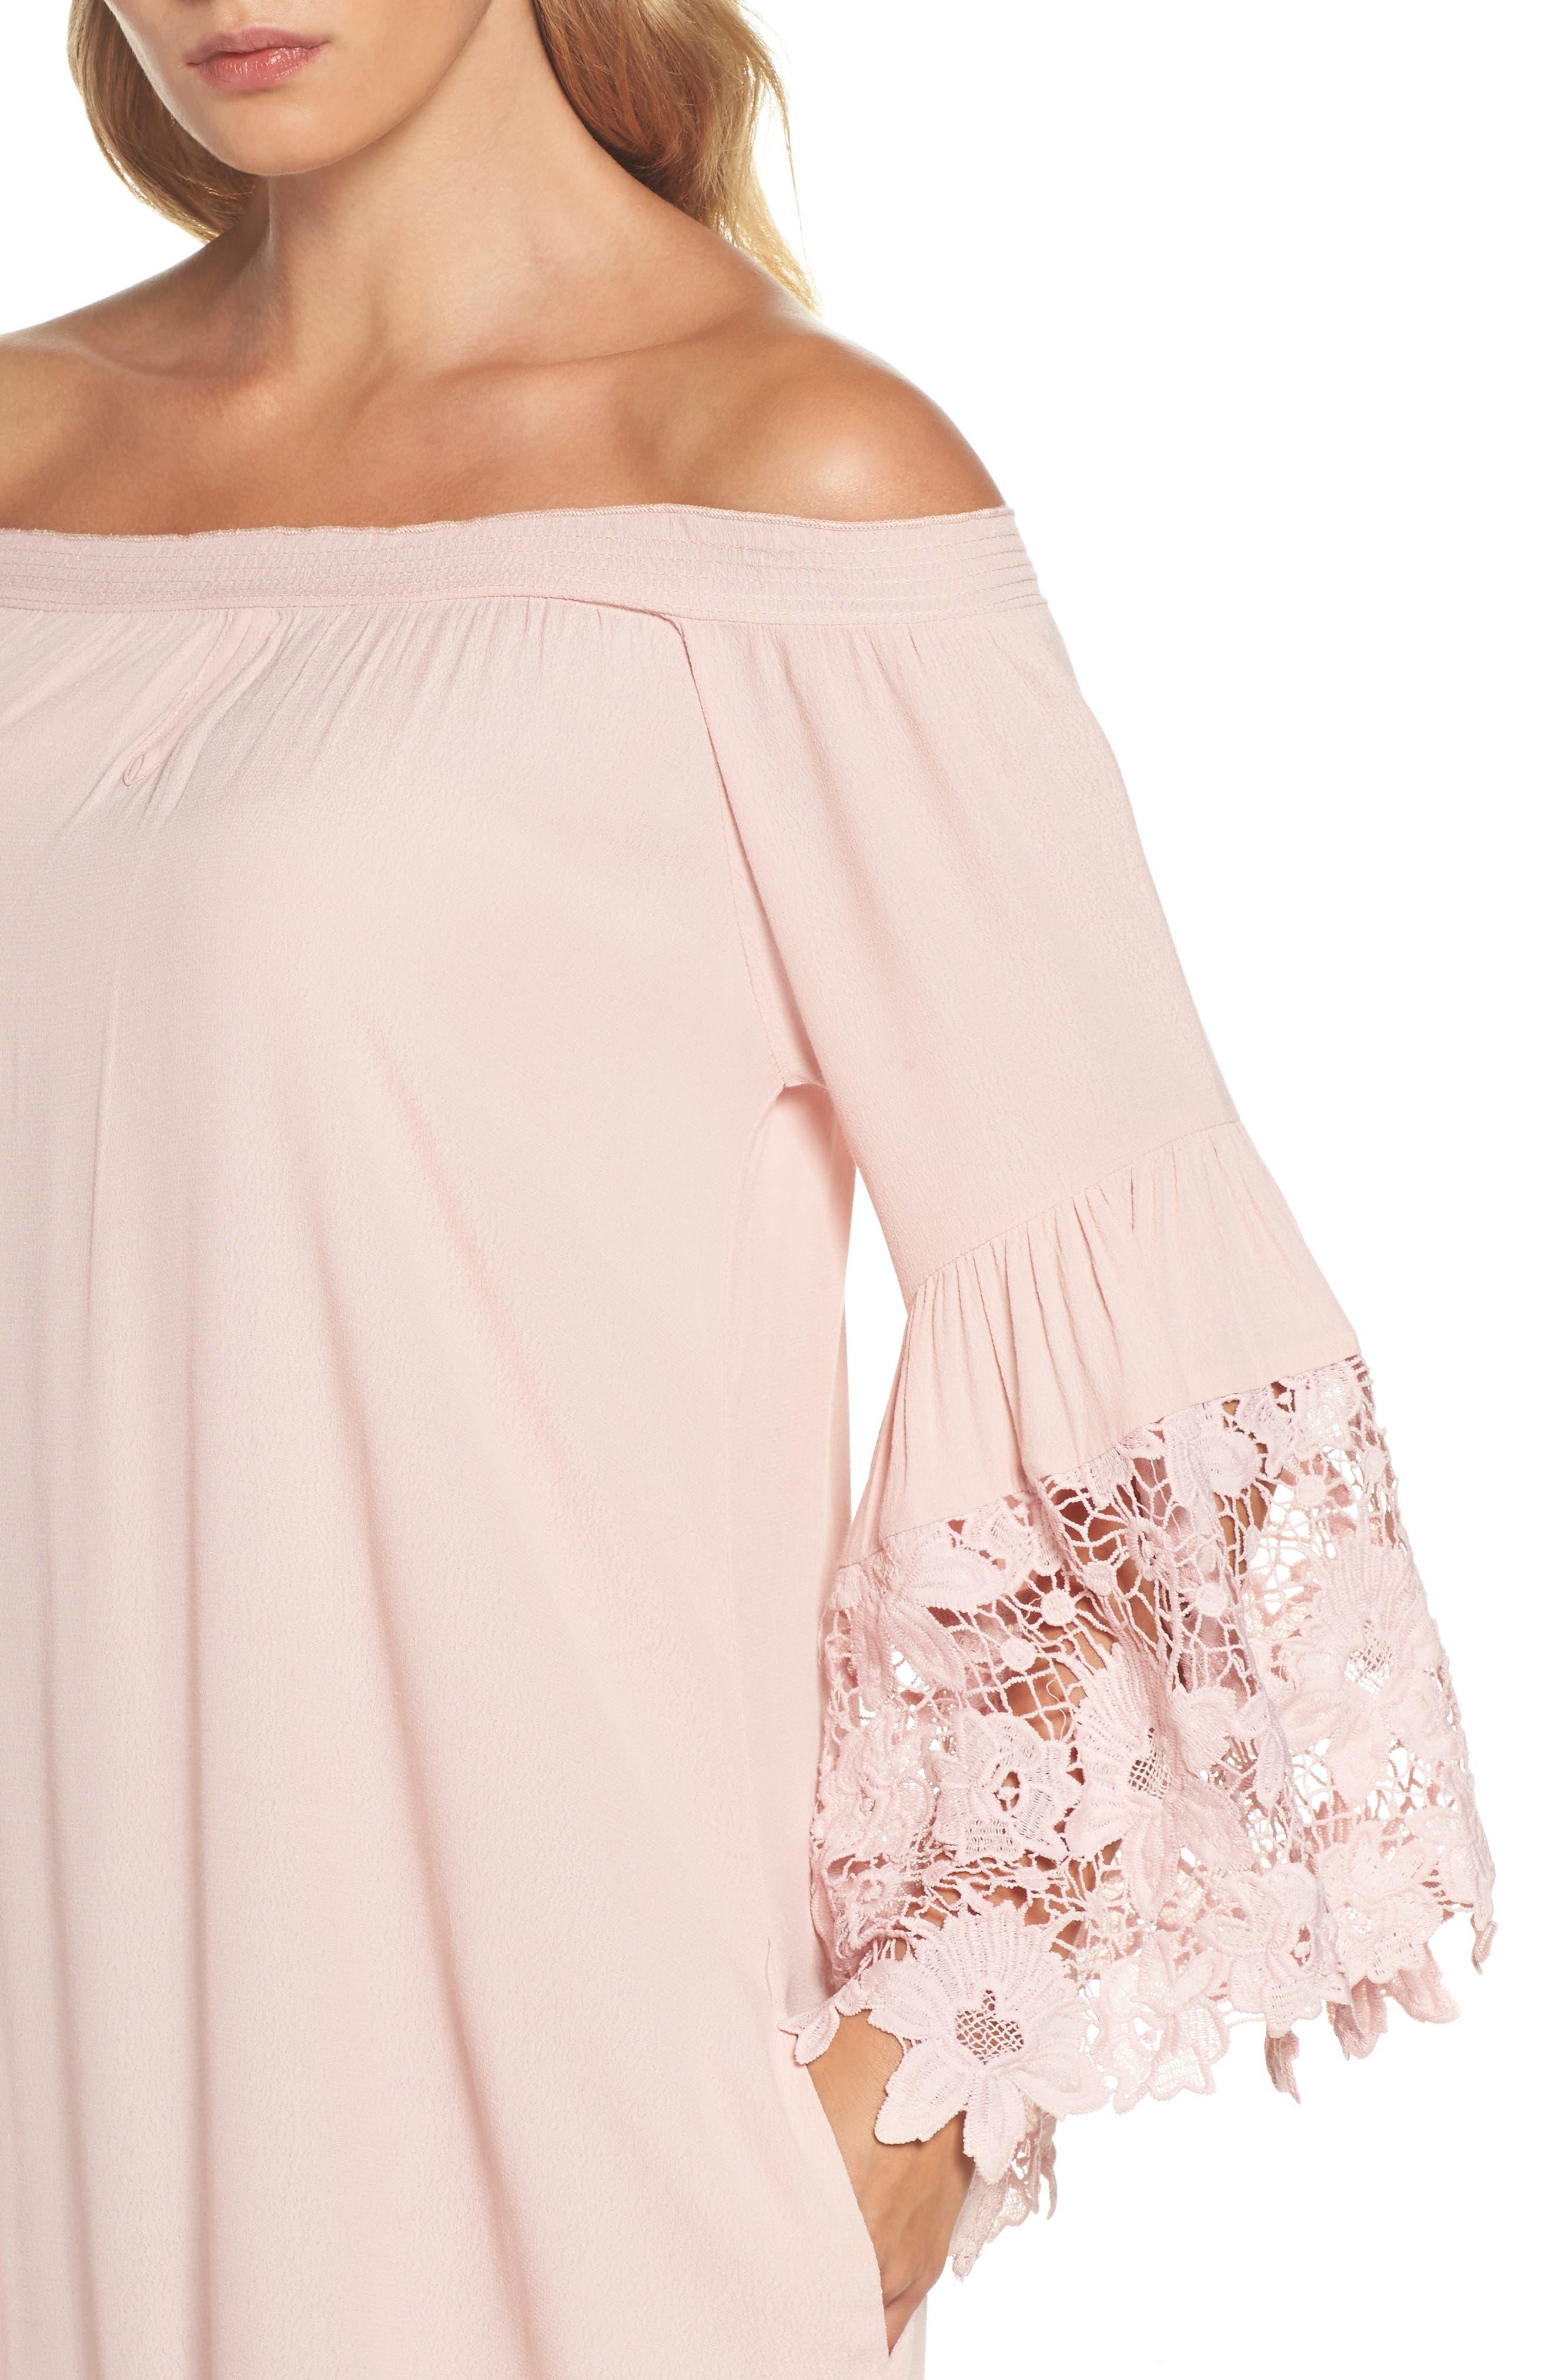 Alternate Image 3  - Muche et Muchette Jolie Lace Accent Cover-Up Dress